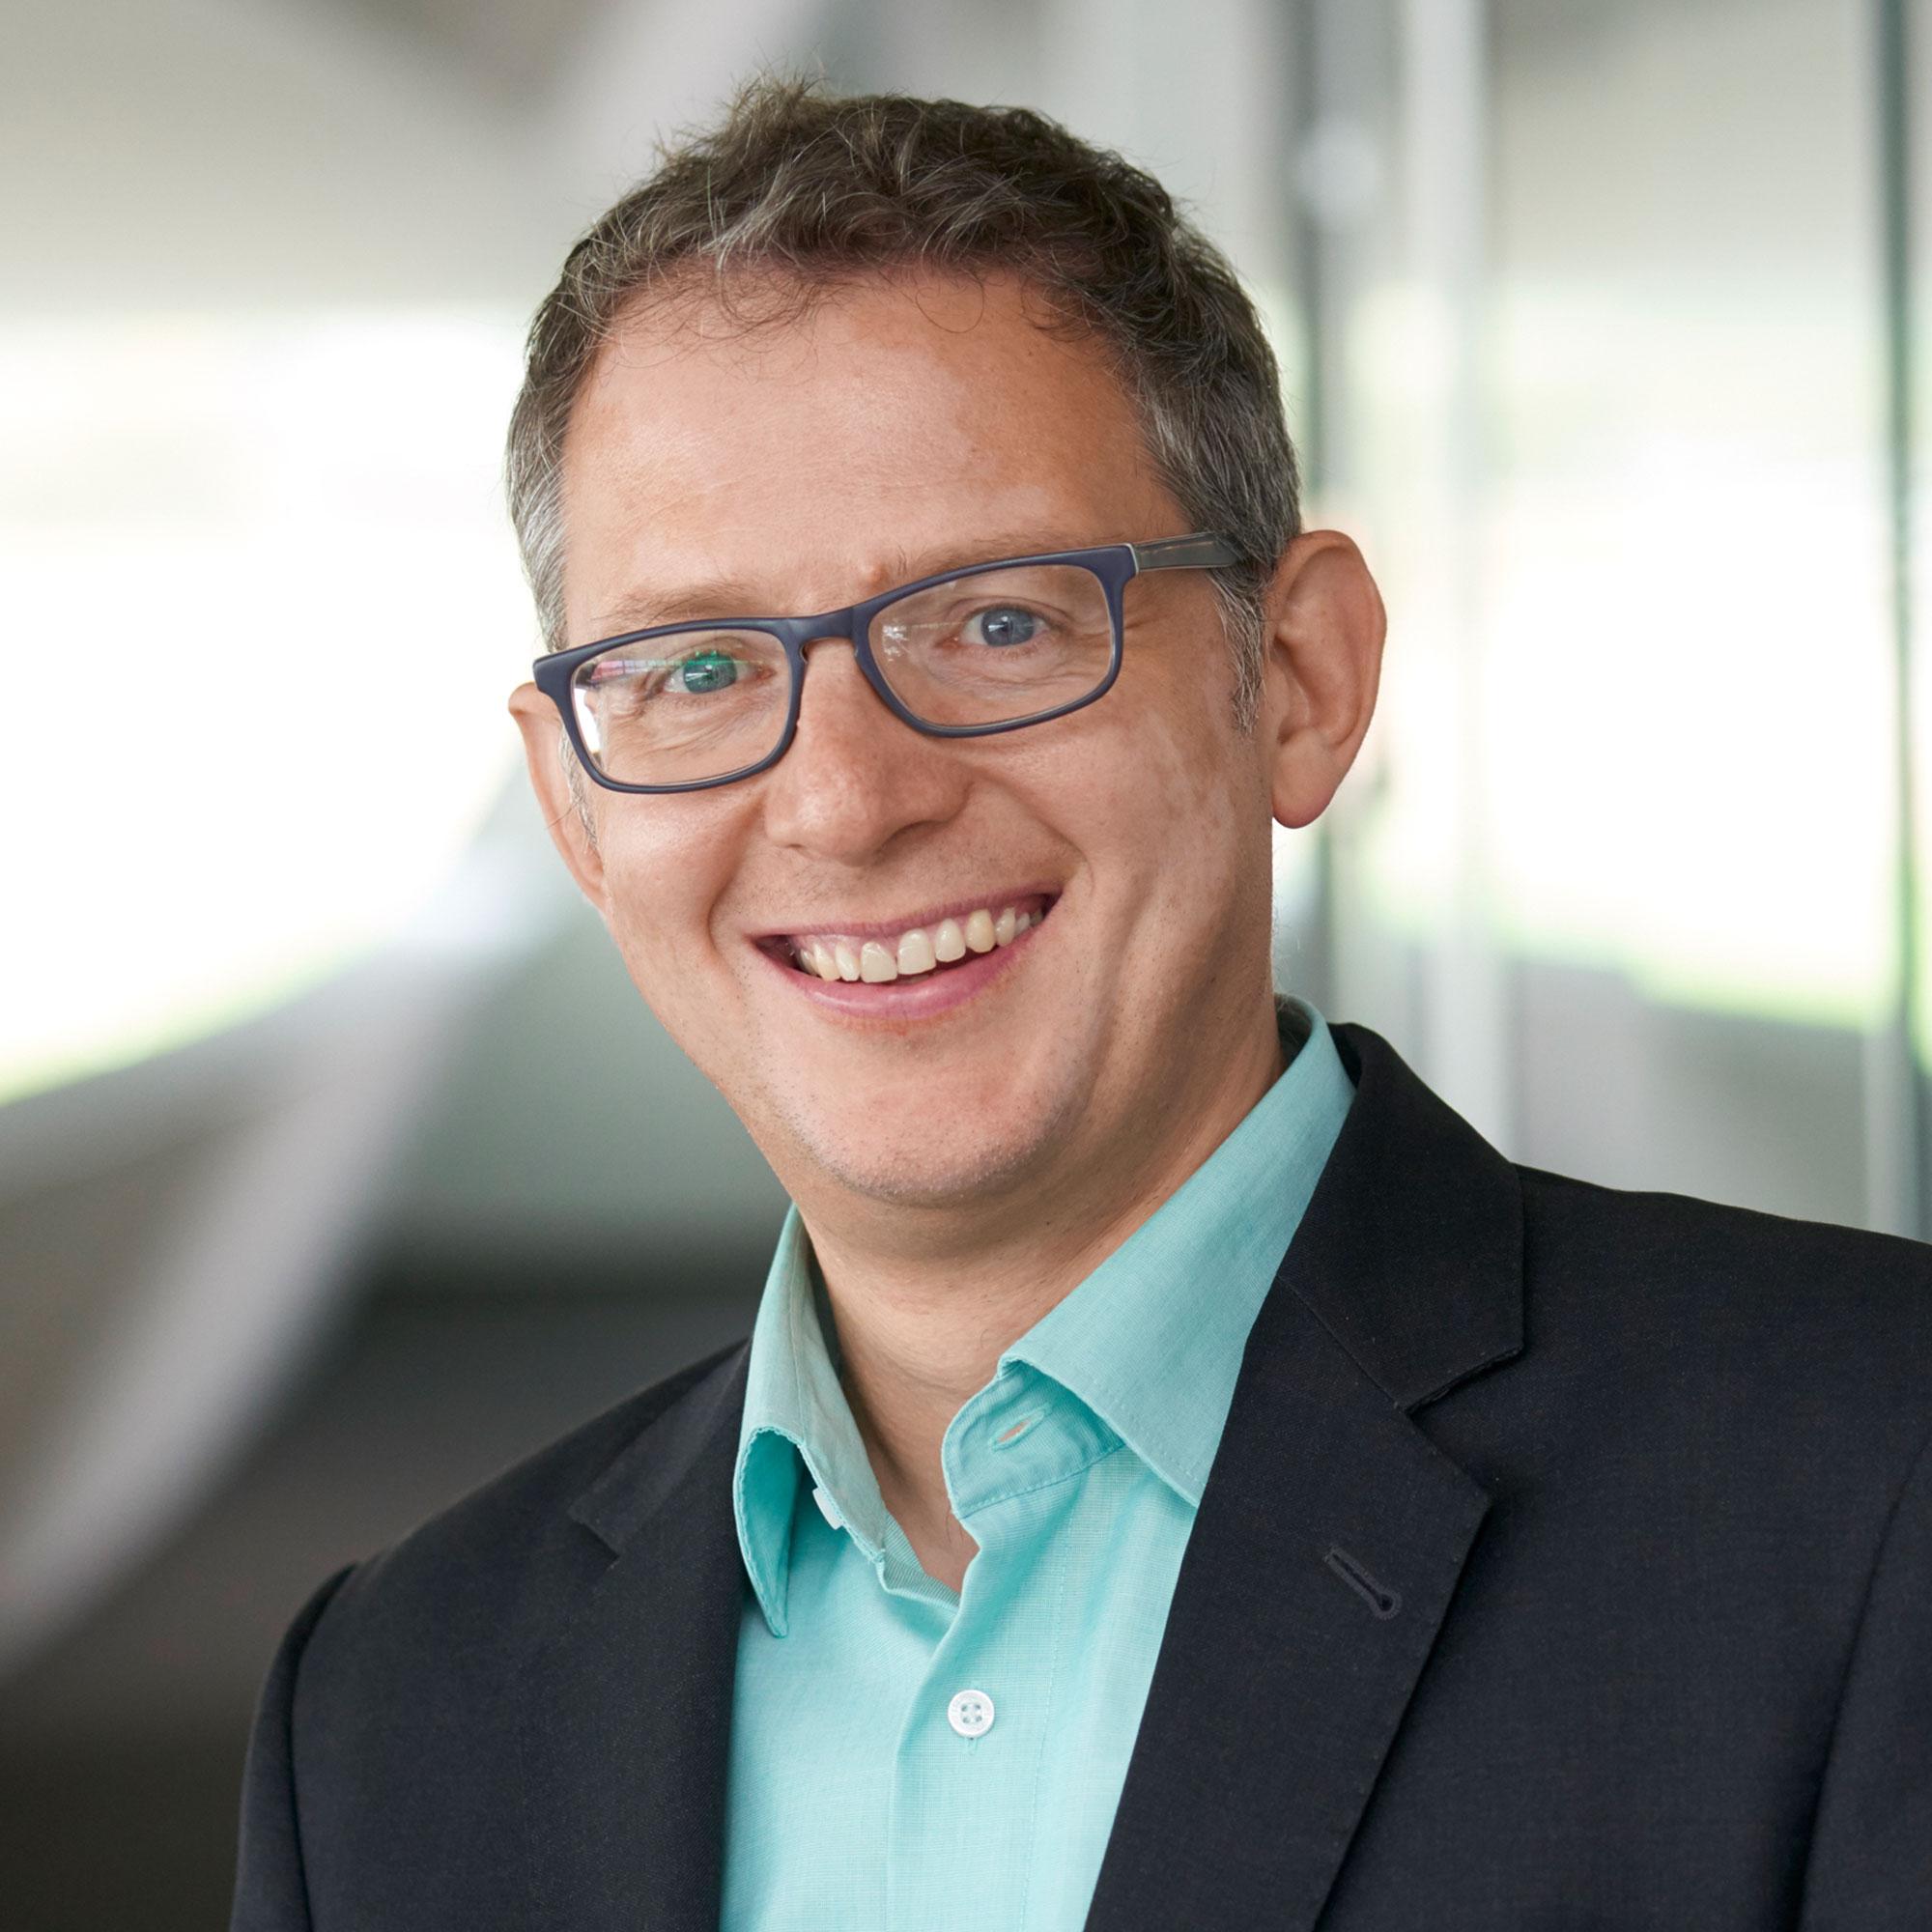 Christian Mehrwald